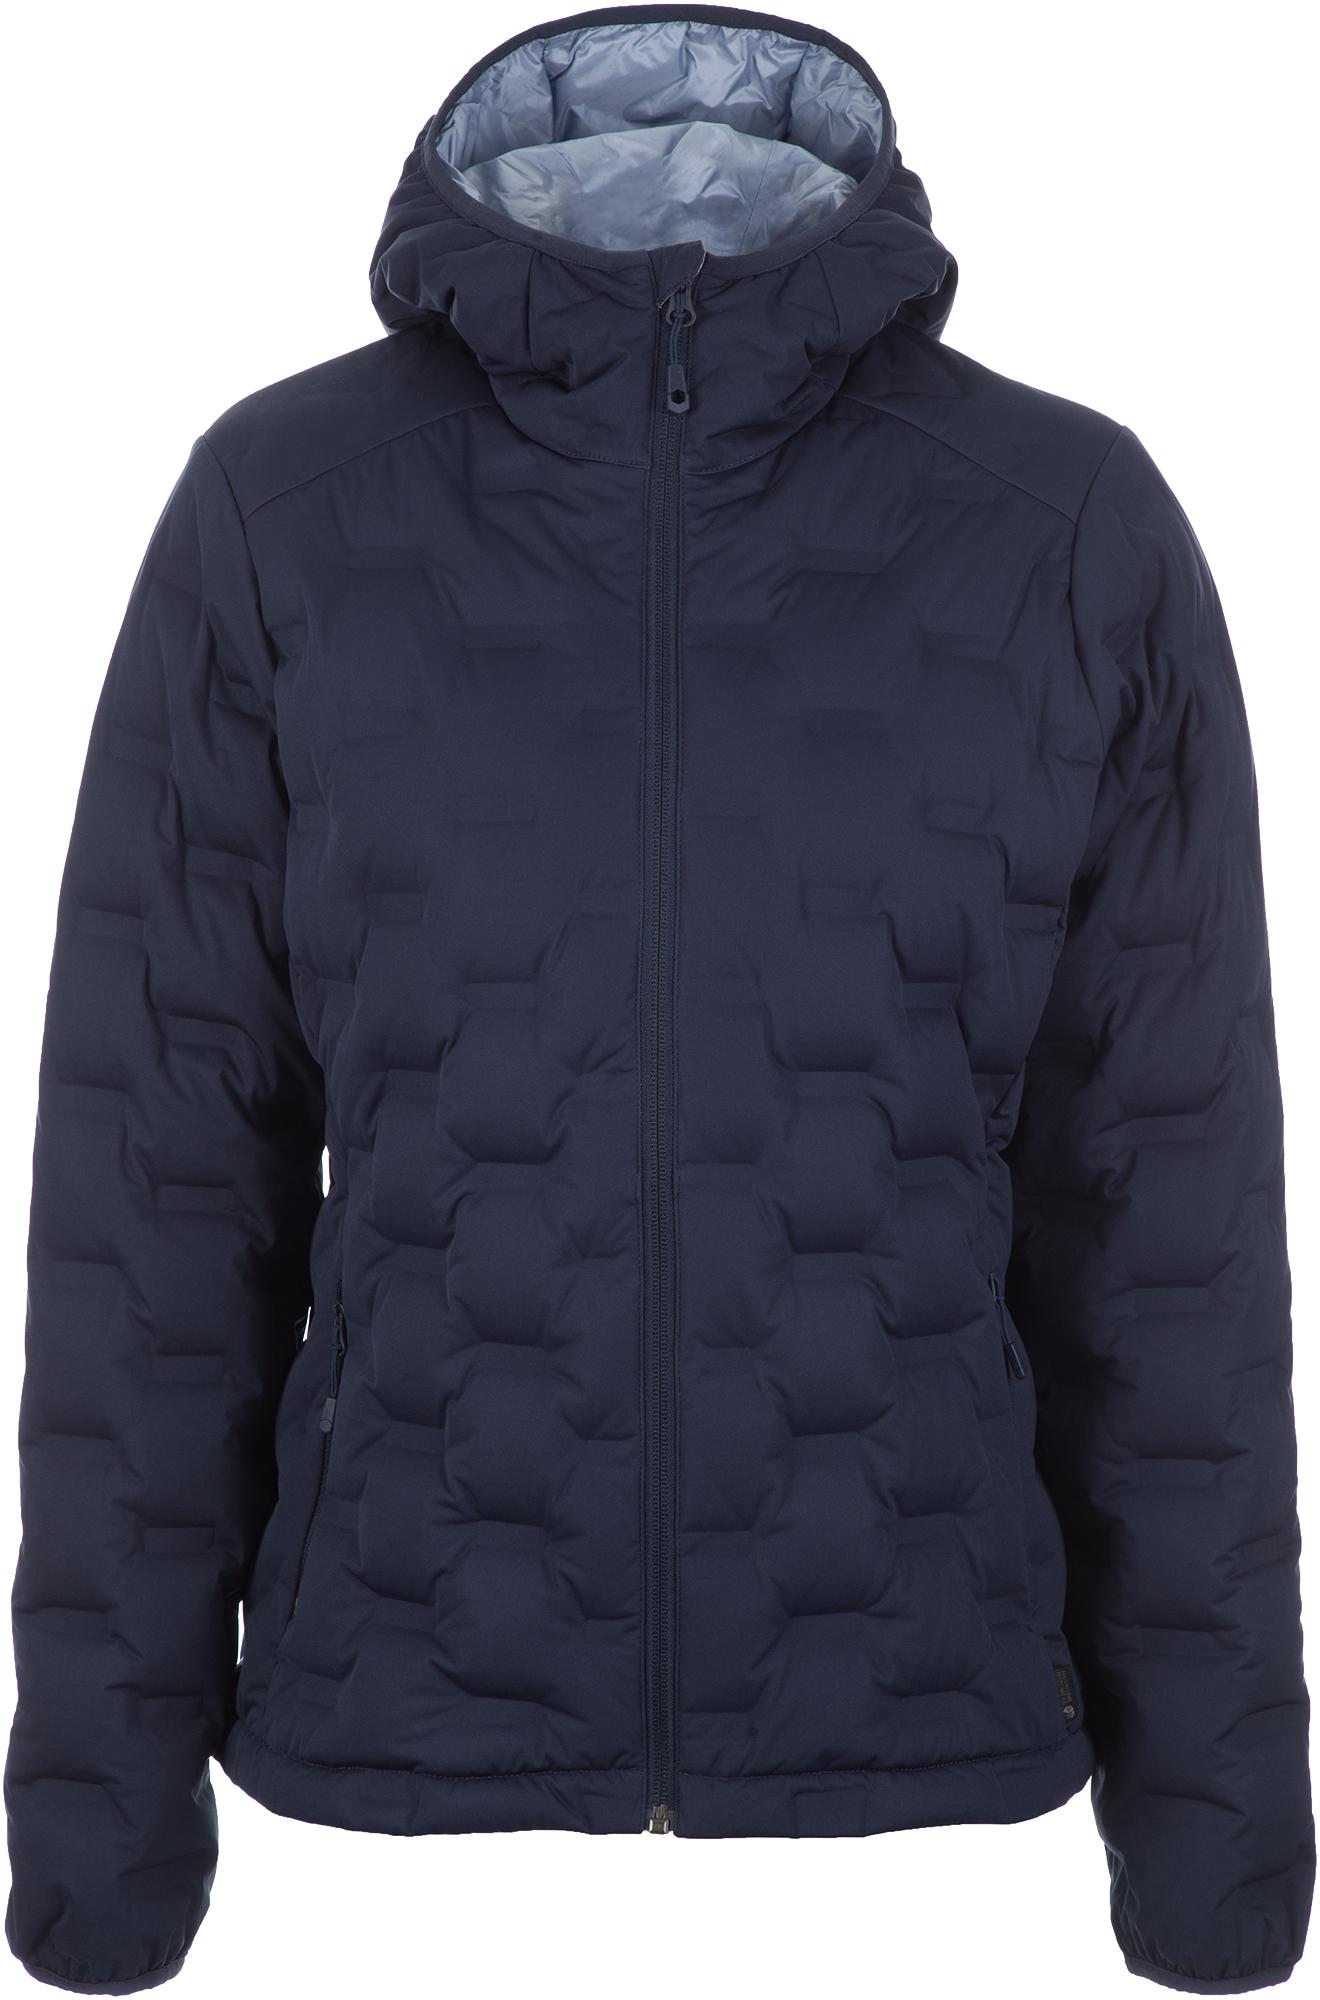 Mountain Hardwear Куртка пуховая женская Mountain Hardwear Stretchdown, размер 50 цена